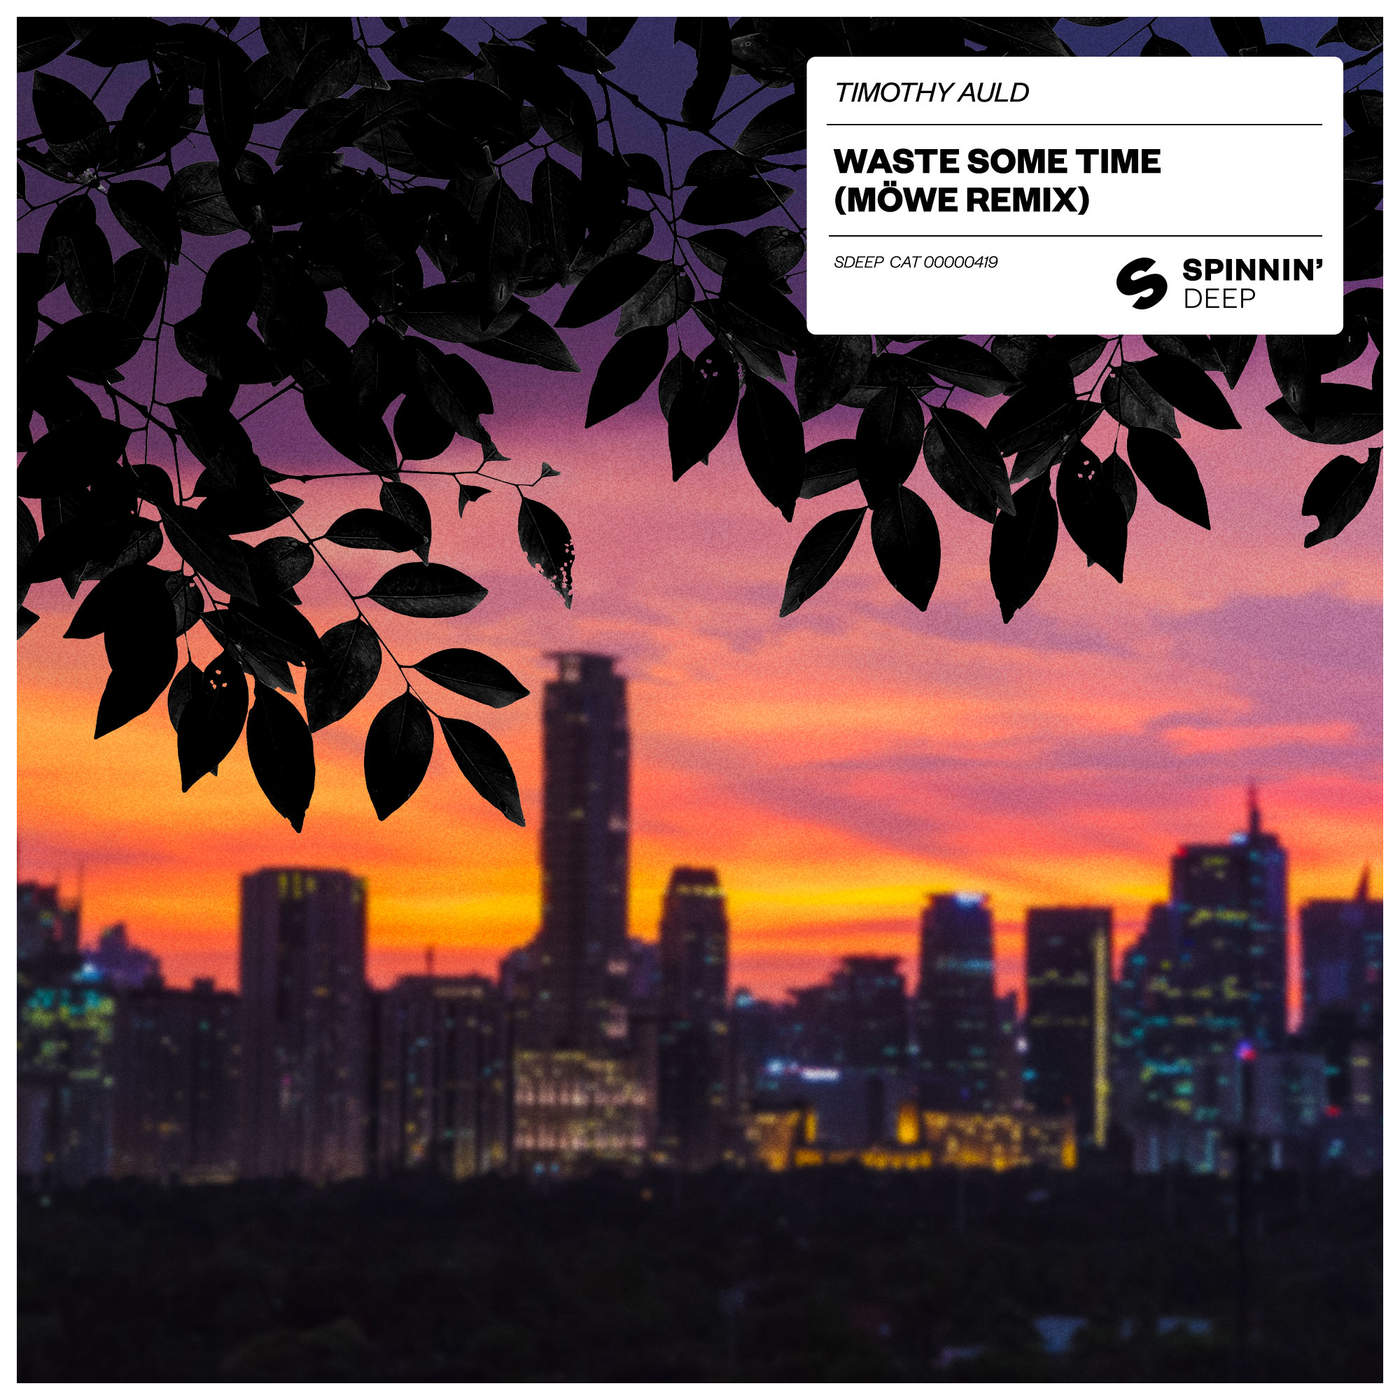 Timothy Auld - Waste Some Time (Möwe Remix) - Single